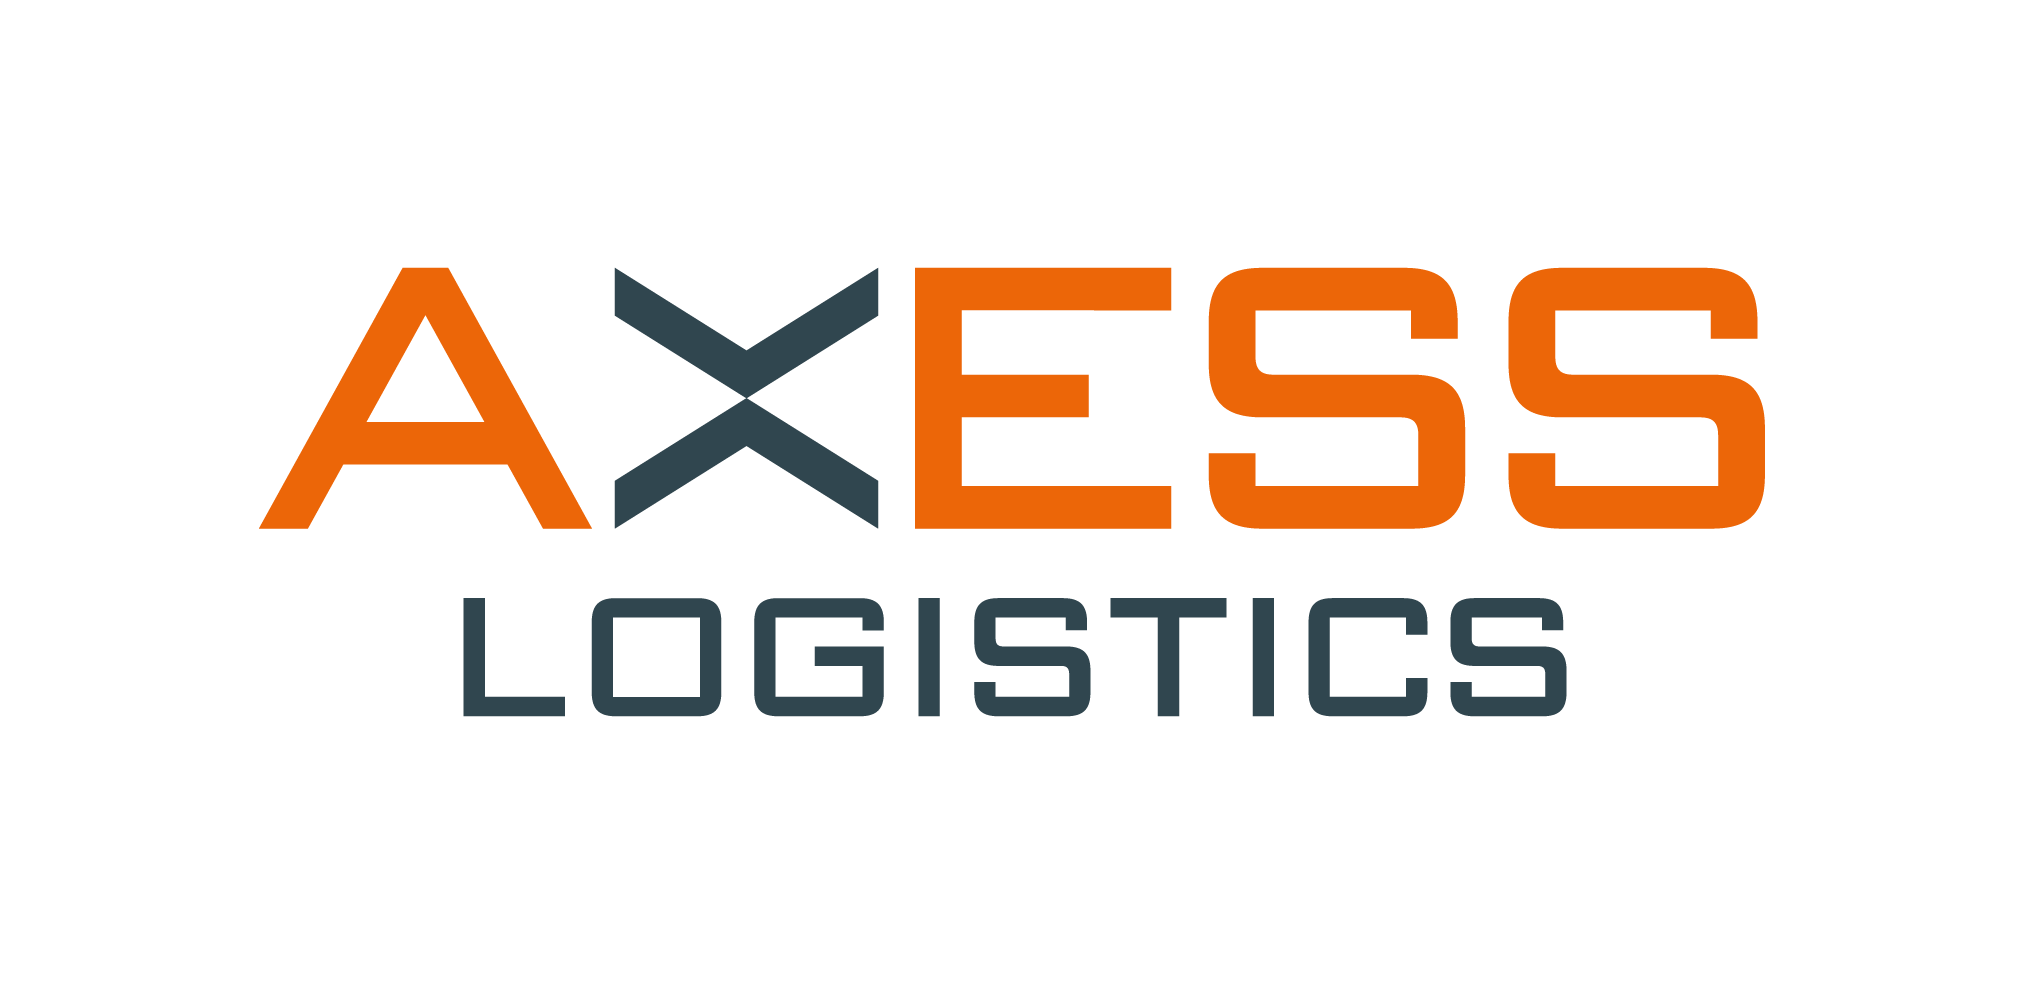 AXESS Logistics